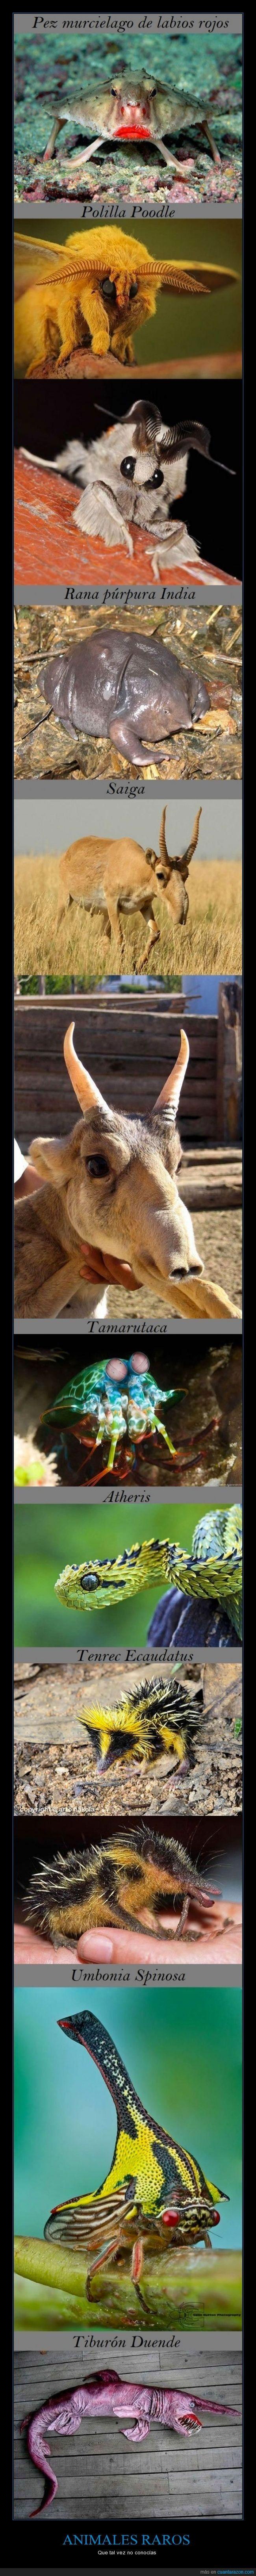 48 best Animales raros images on Pinterest | Animales extraños ...